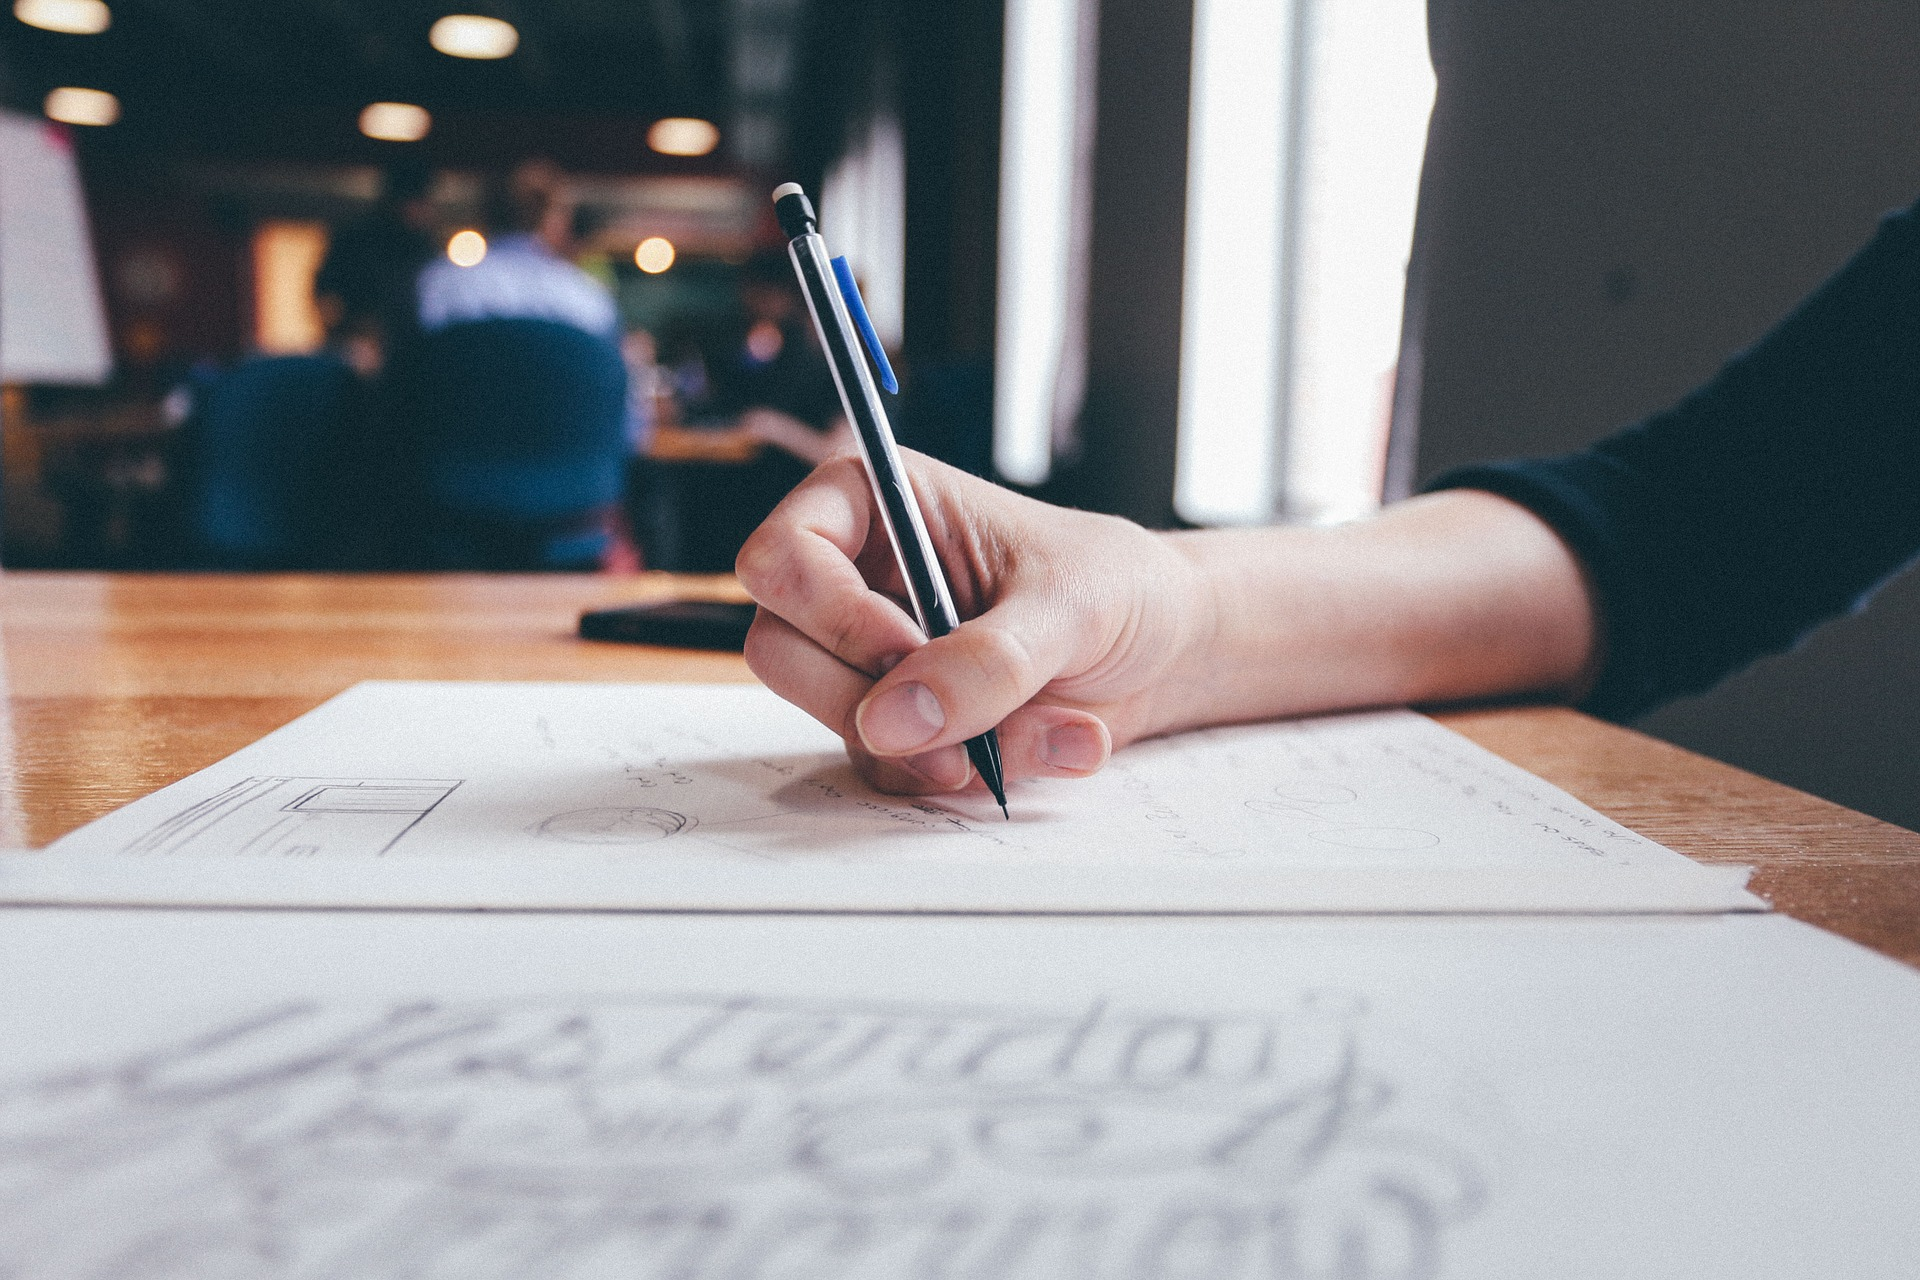 handwriting and health